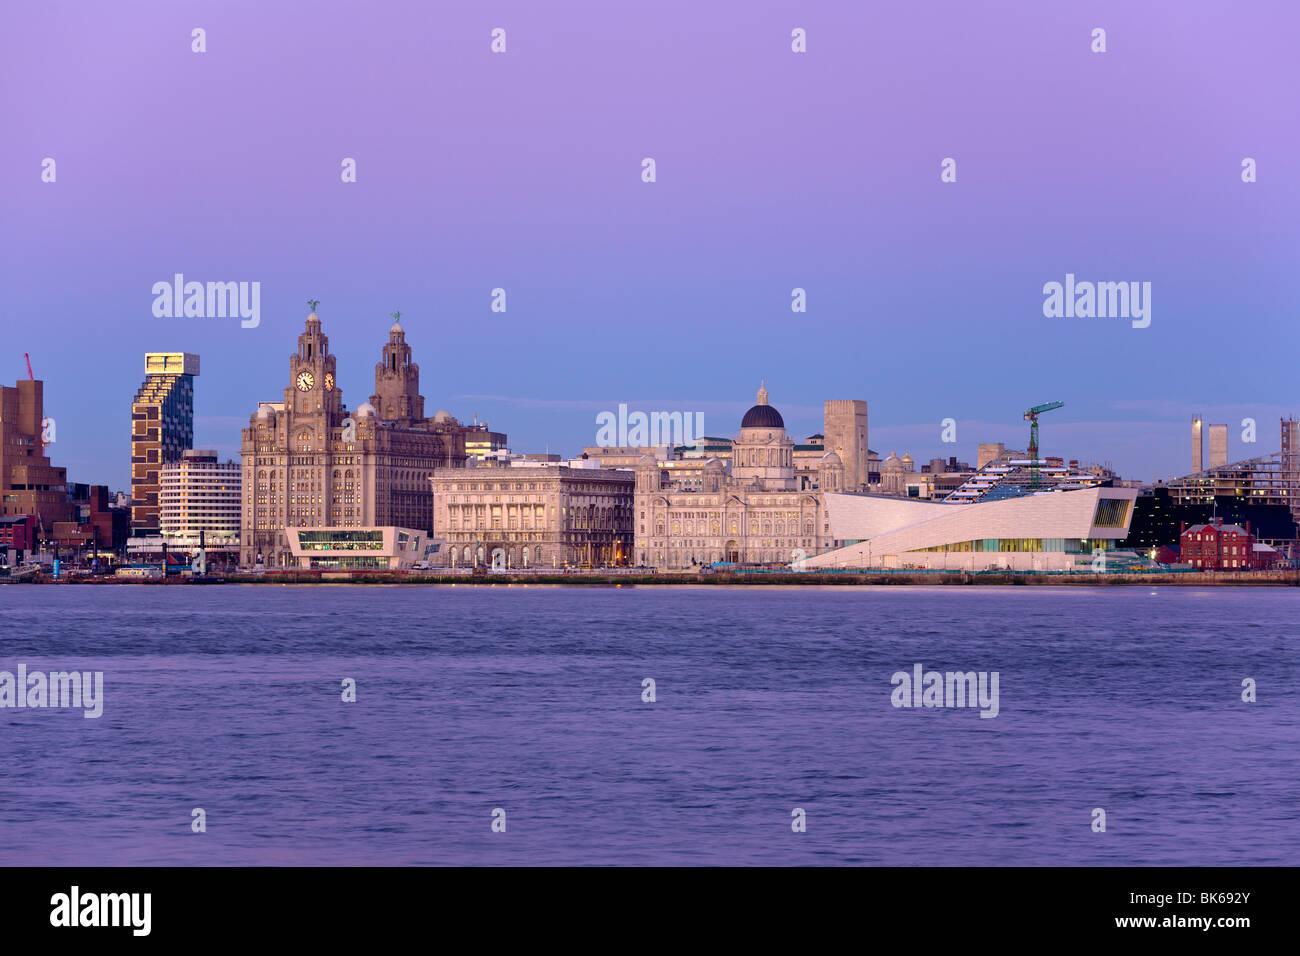 Skyline and Waterfront, Liverpool, Merseyside, England - Stock Image